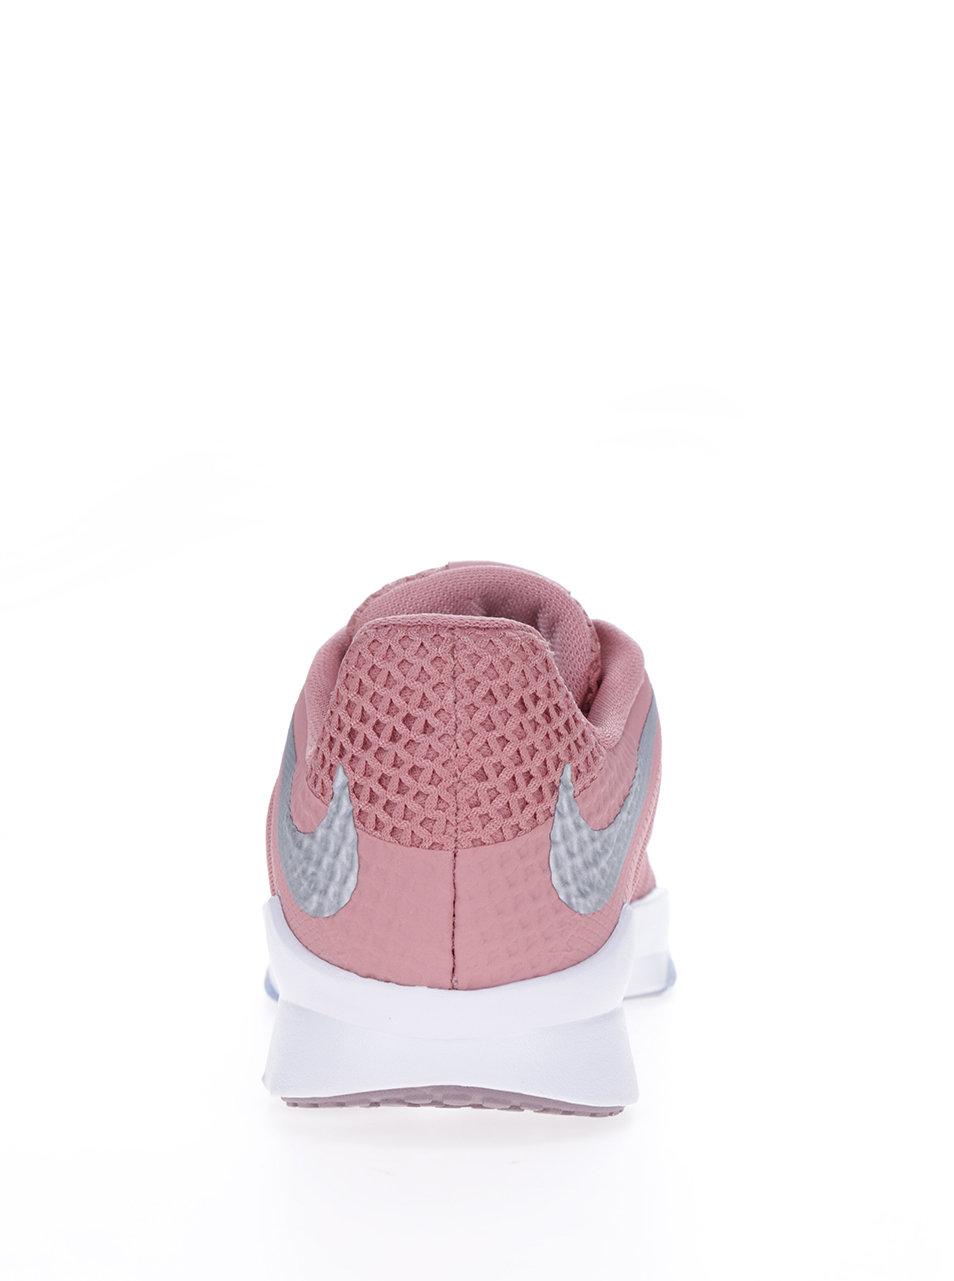 8f027deadd02 Pantofi sport roz pentru femei Nike Air Zoom Condition ...